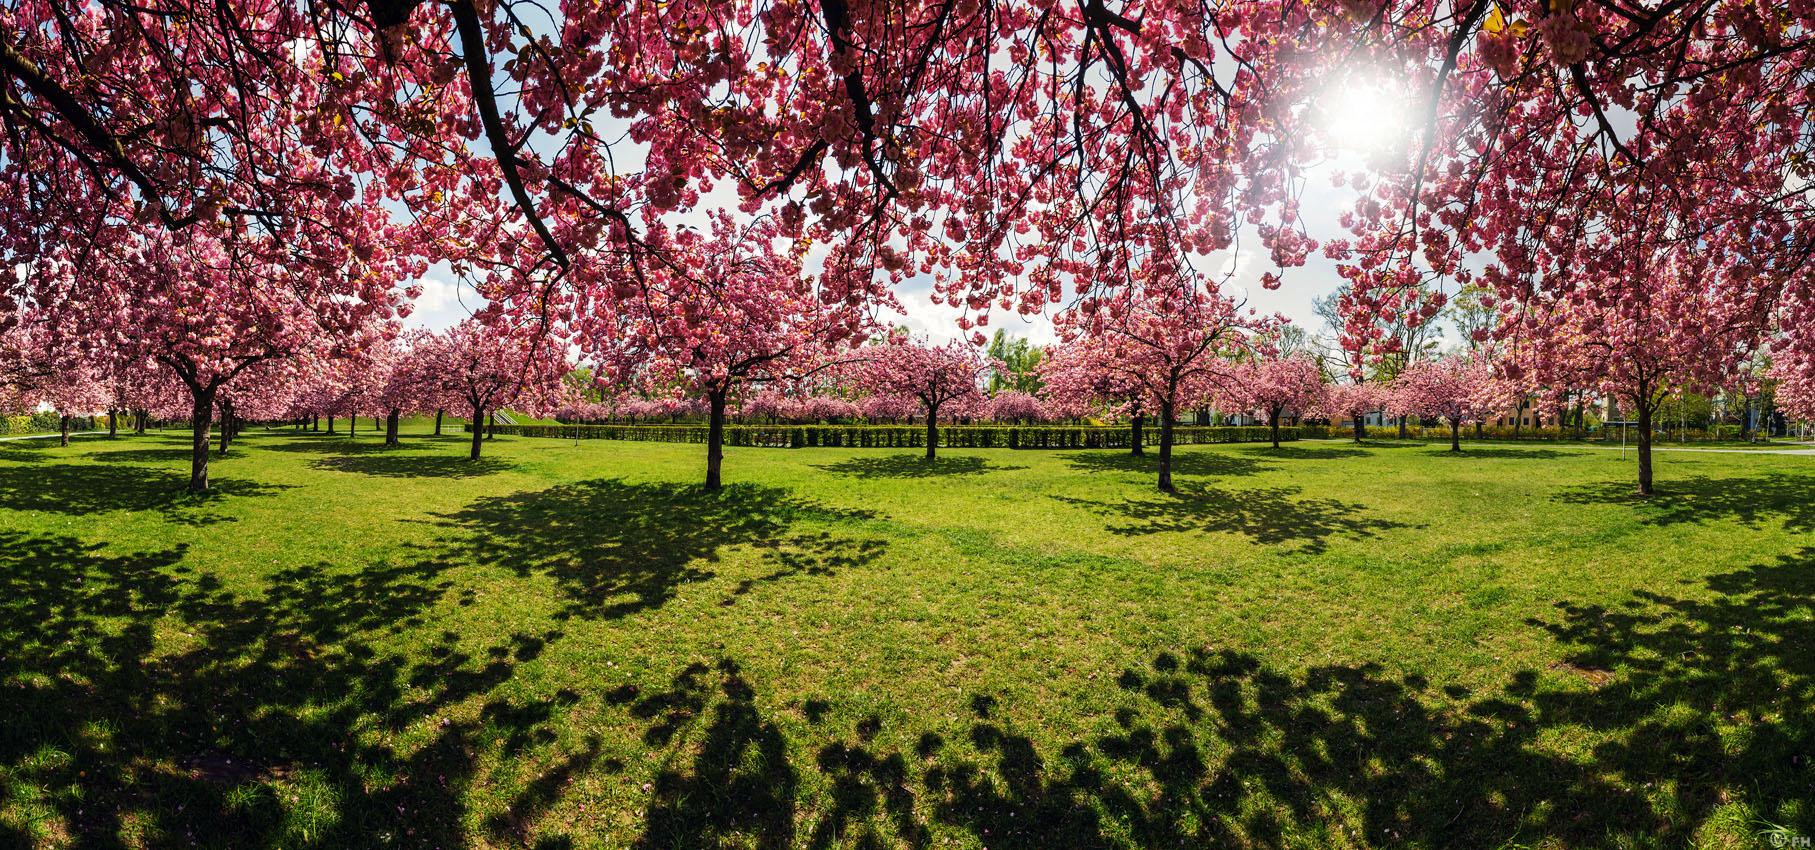 CherryBlossom_Pano_1_k2